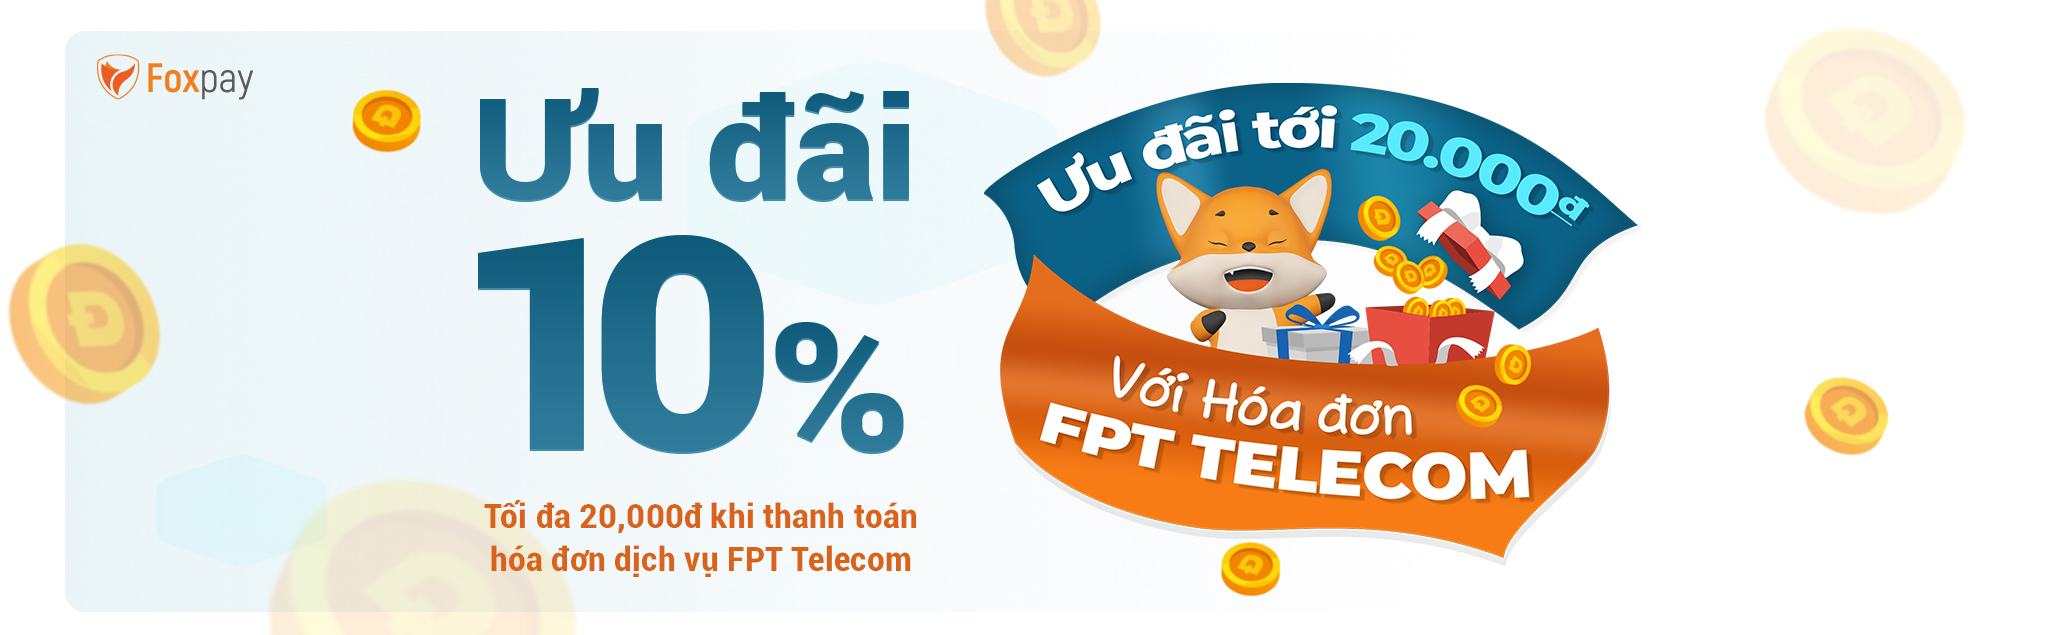 uu-dai-thang-8-giam-20.000-dong-khi-thanh-toan-hoa-don-dich-vu-fpt-telecom-tren-vi-foxpay